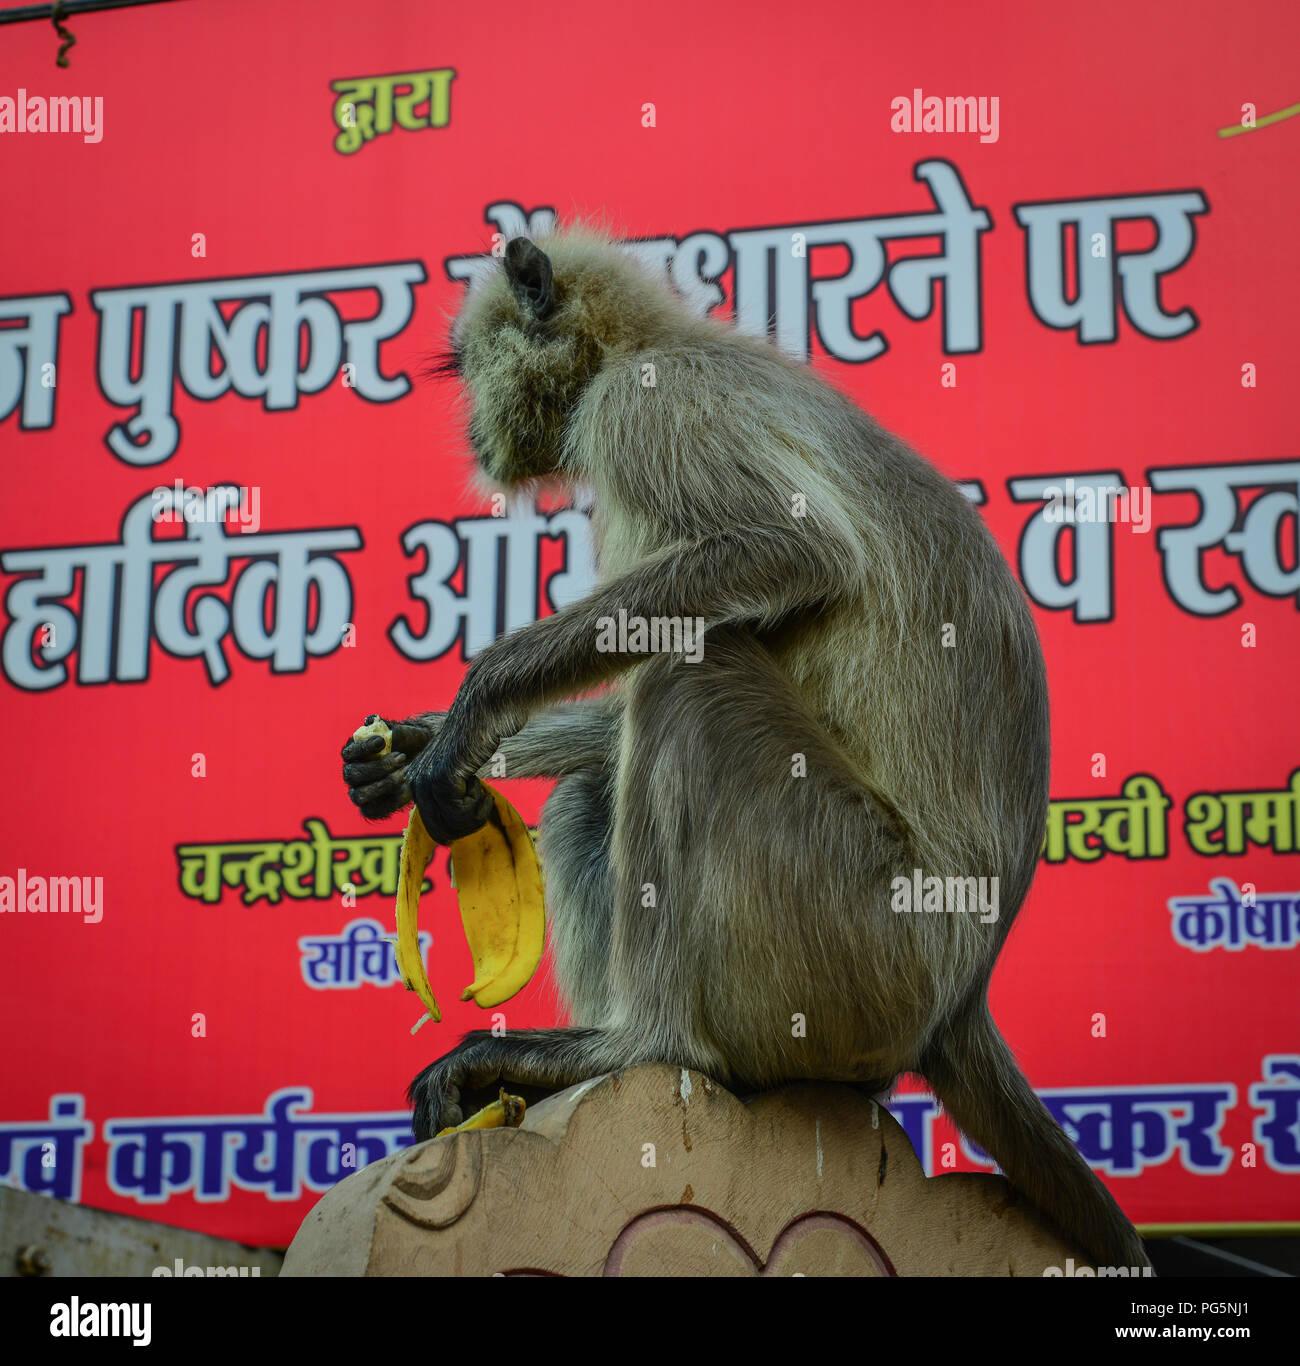 Pushkar, India - Nov 5, 2017. Monkey eating banana at street market in Pushkar, India. - Stock Image